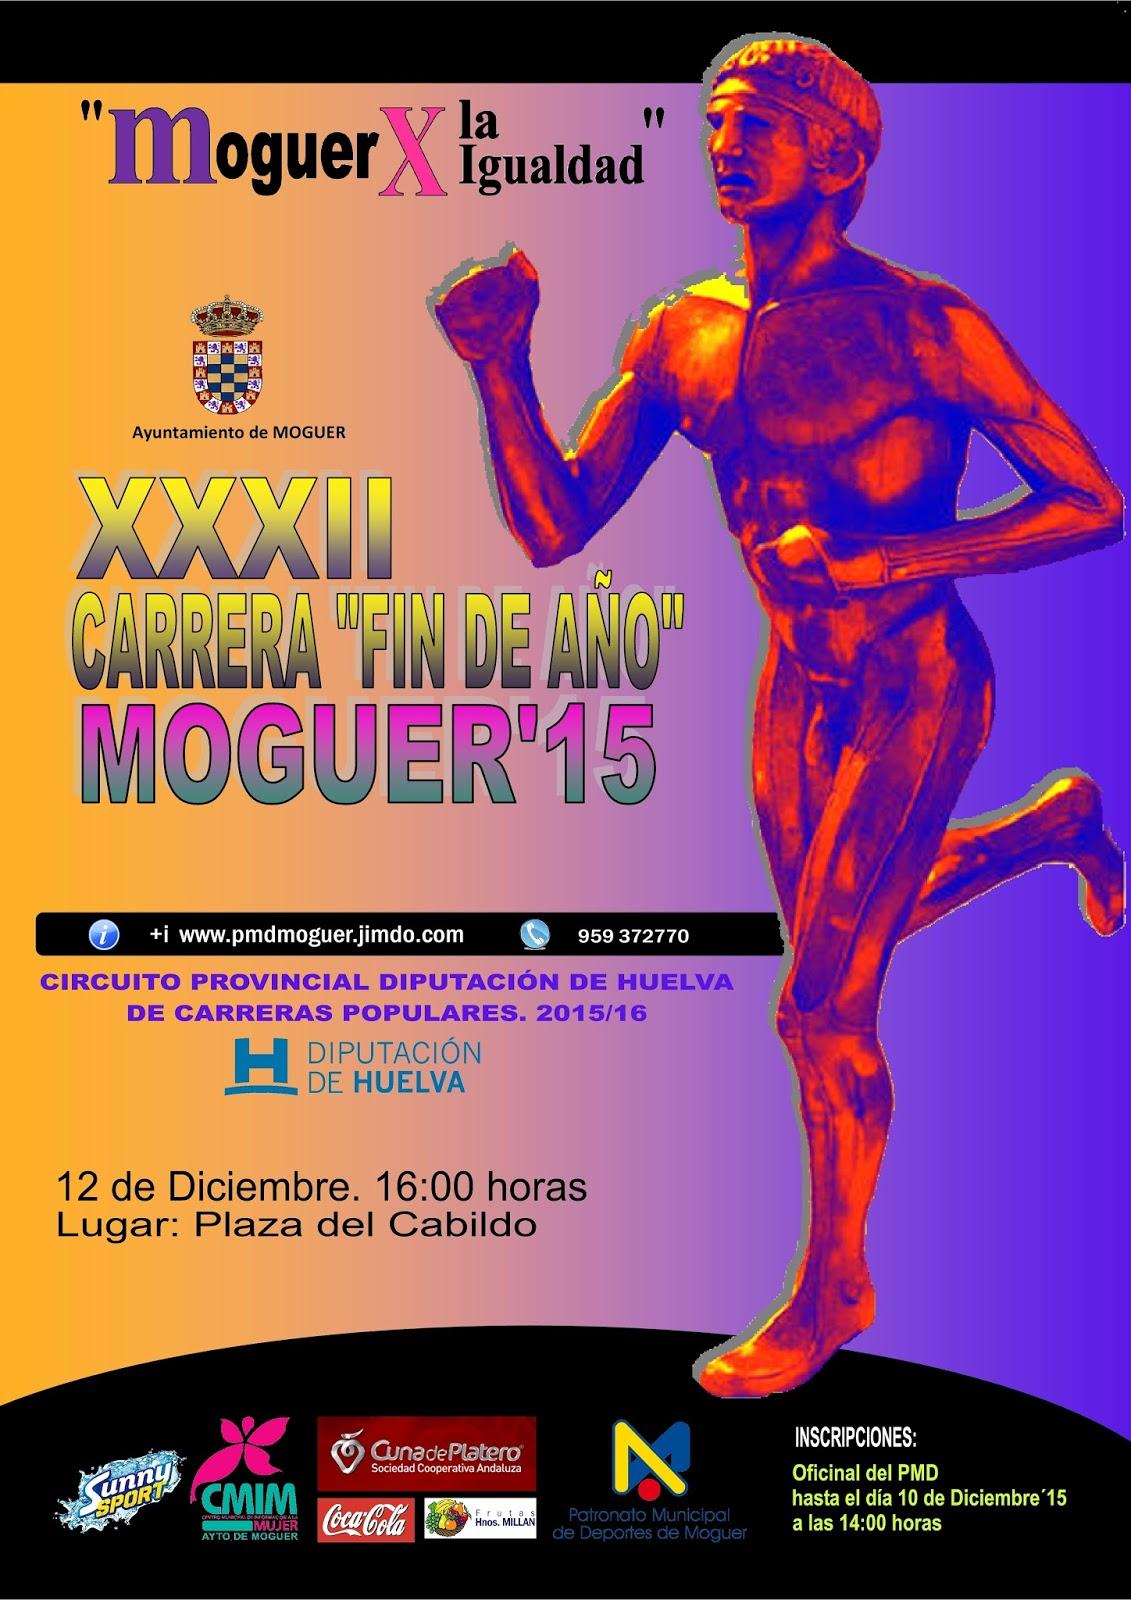 Moguer Celebra la XXXII Carrera Fin de Año